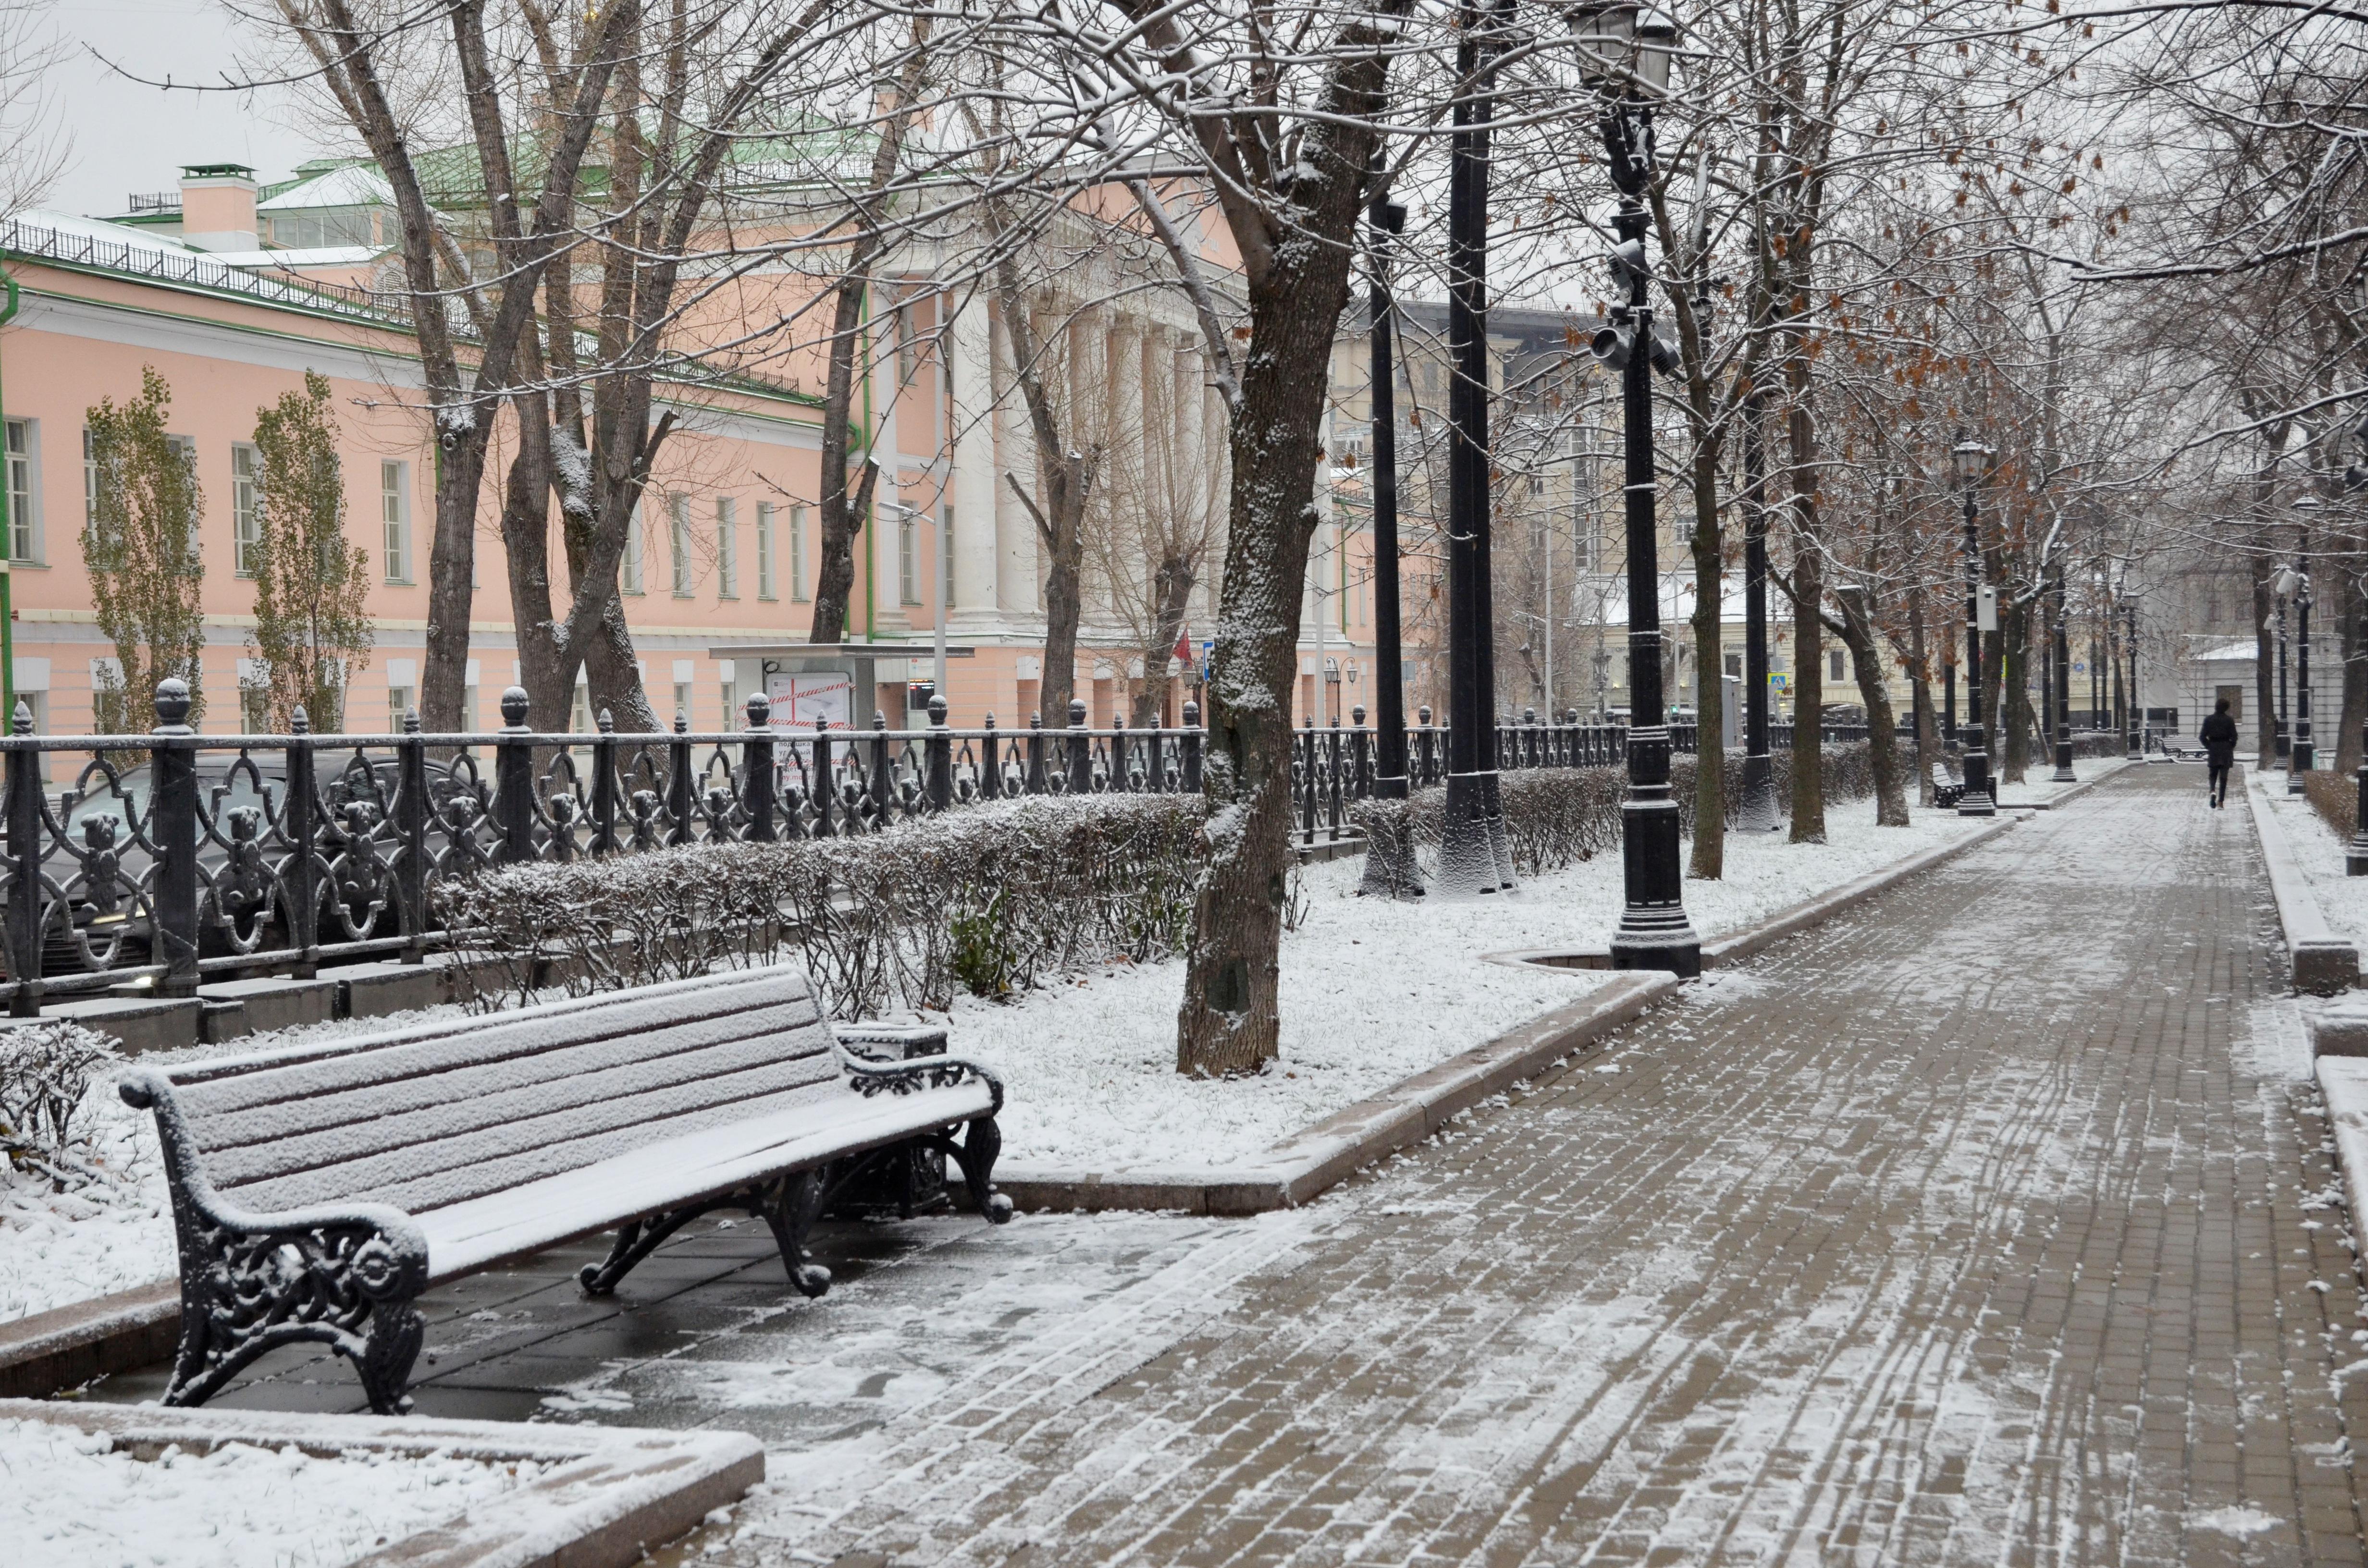 Синоптики прогнозируют снег 4 января в Москве. Фото: Анна Быкова